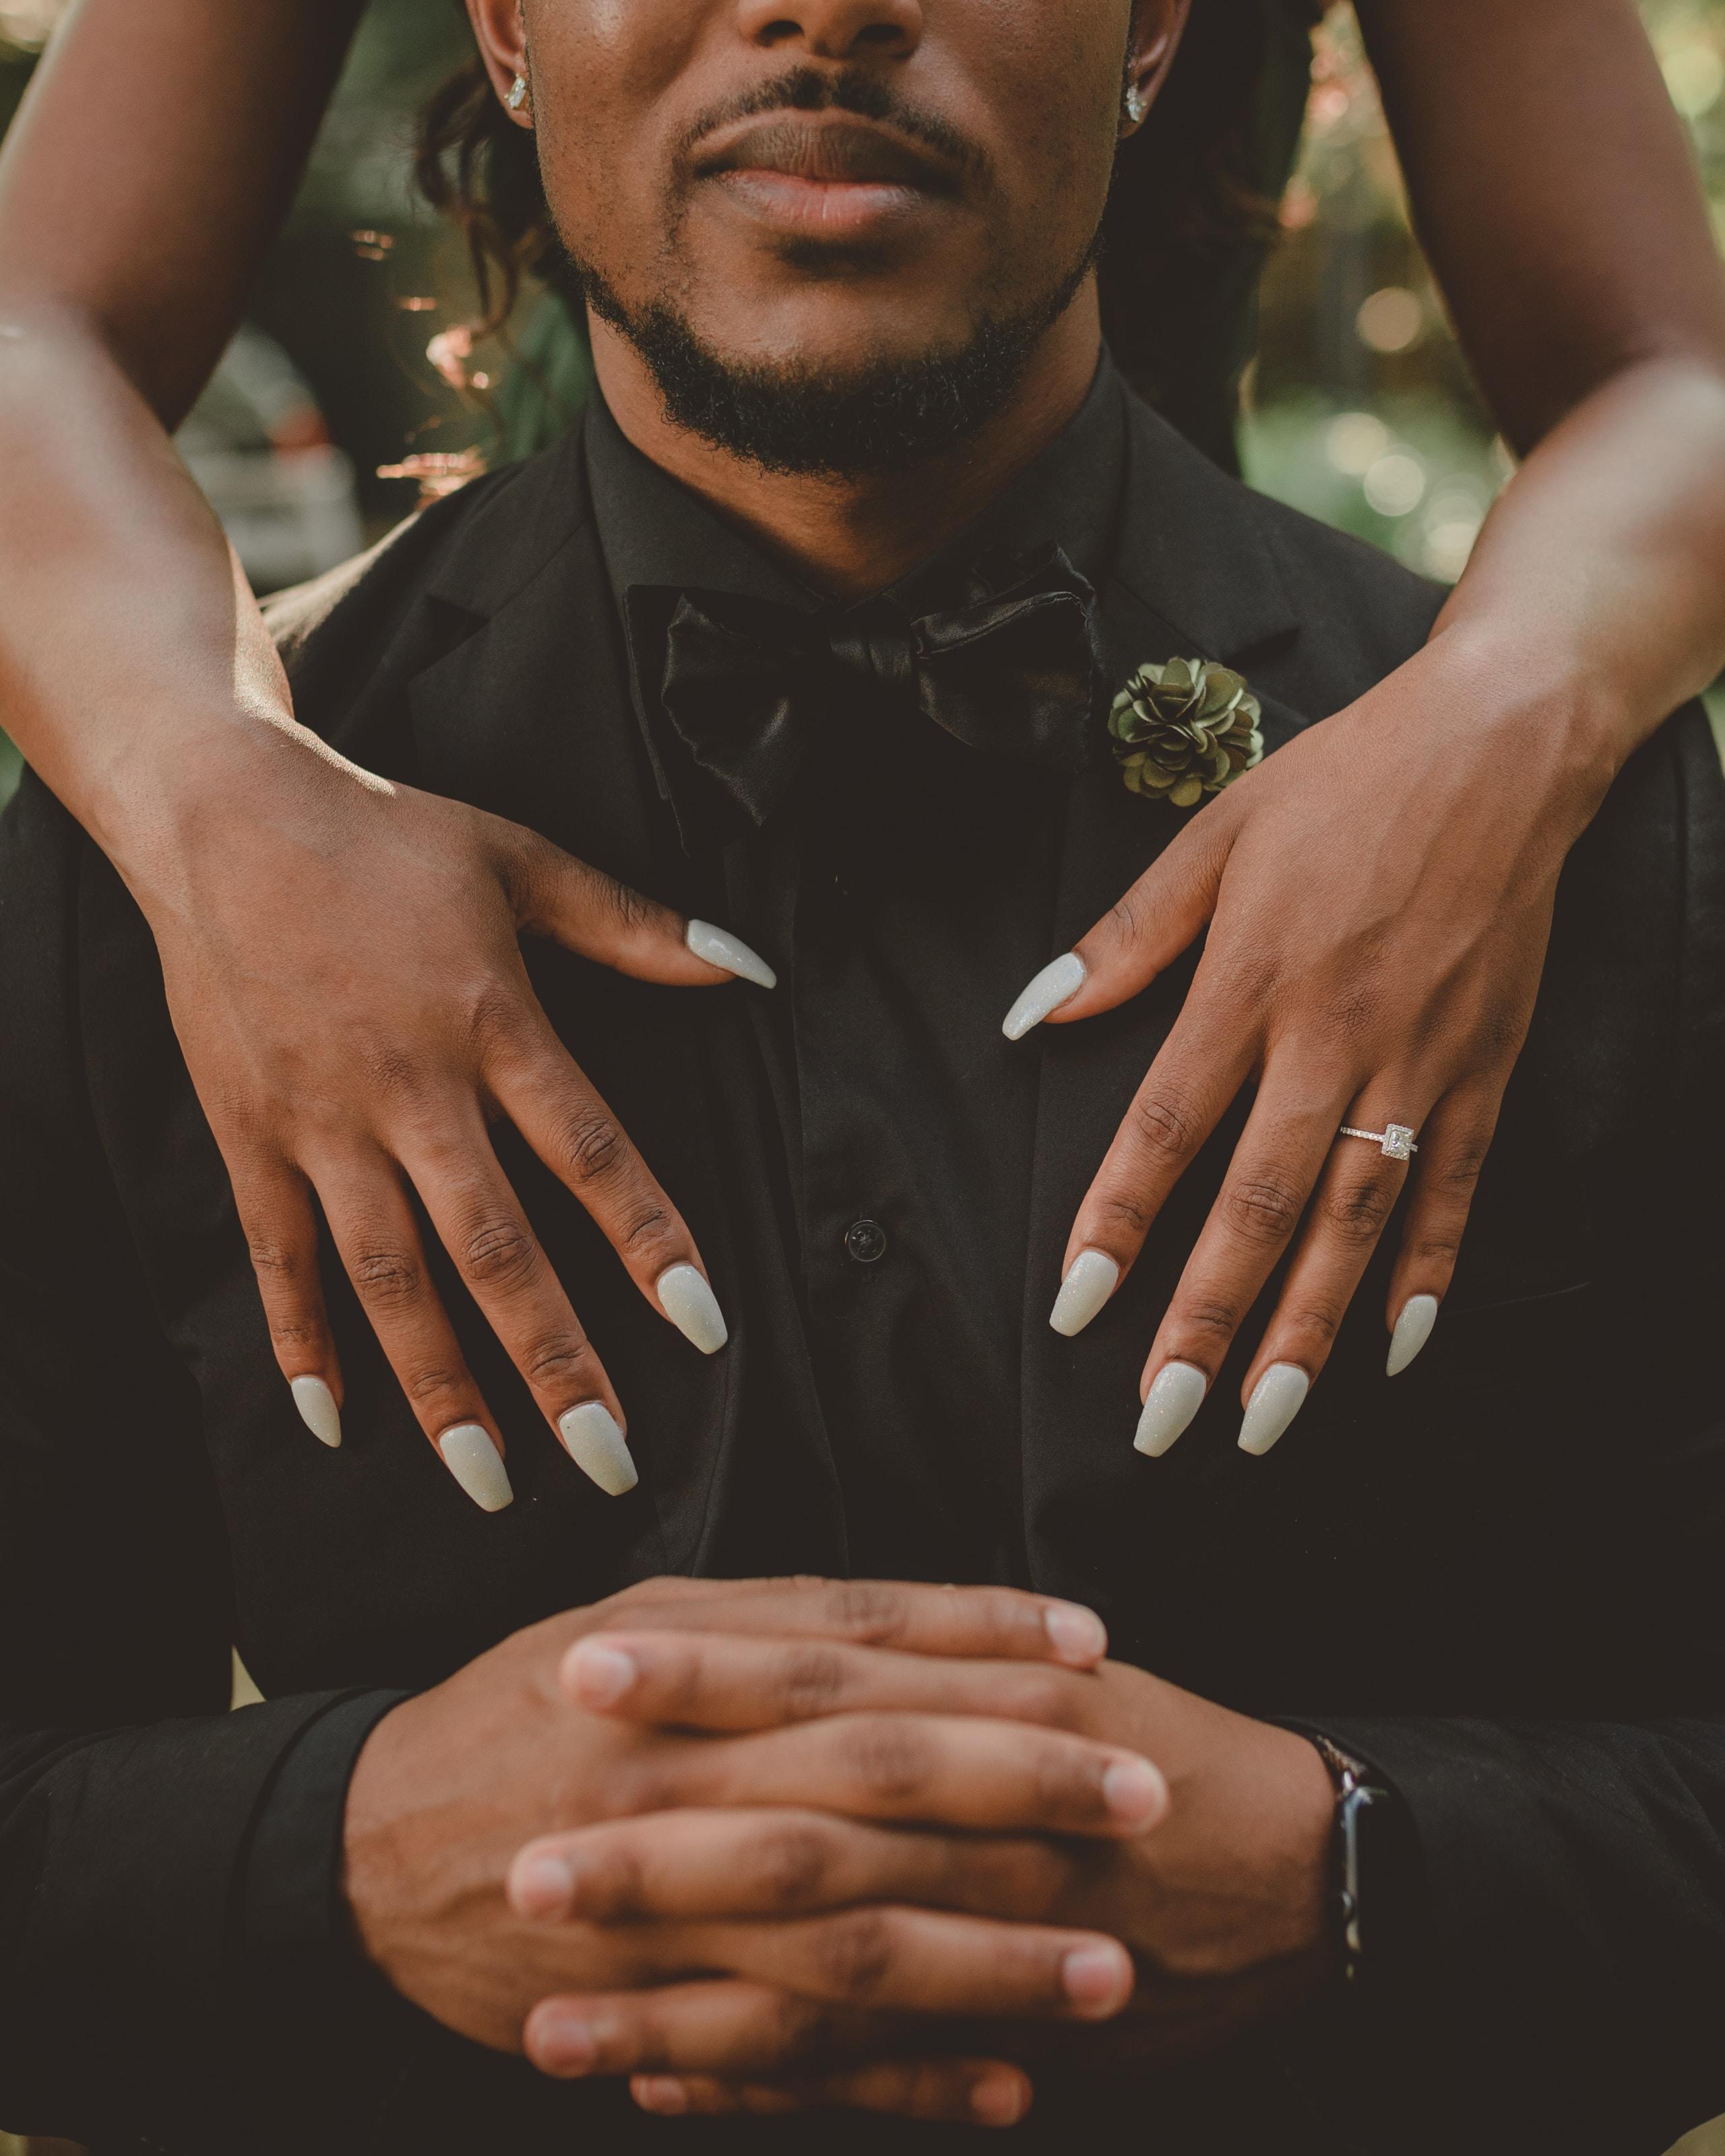 woman standing behind man in black tuxedo